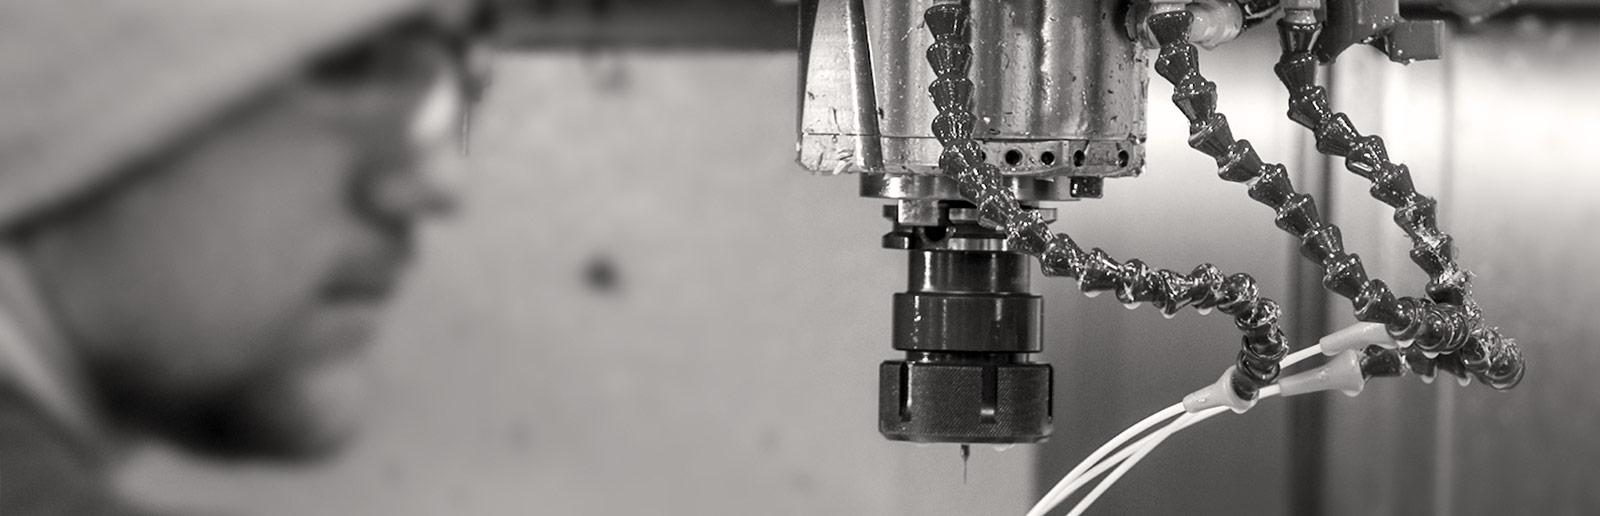 Multivac InterTech machining